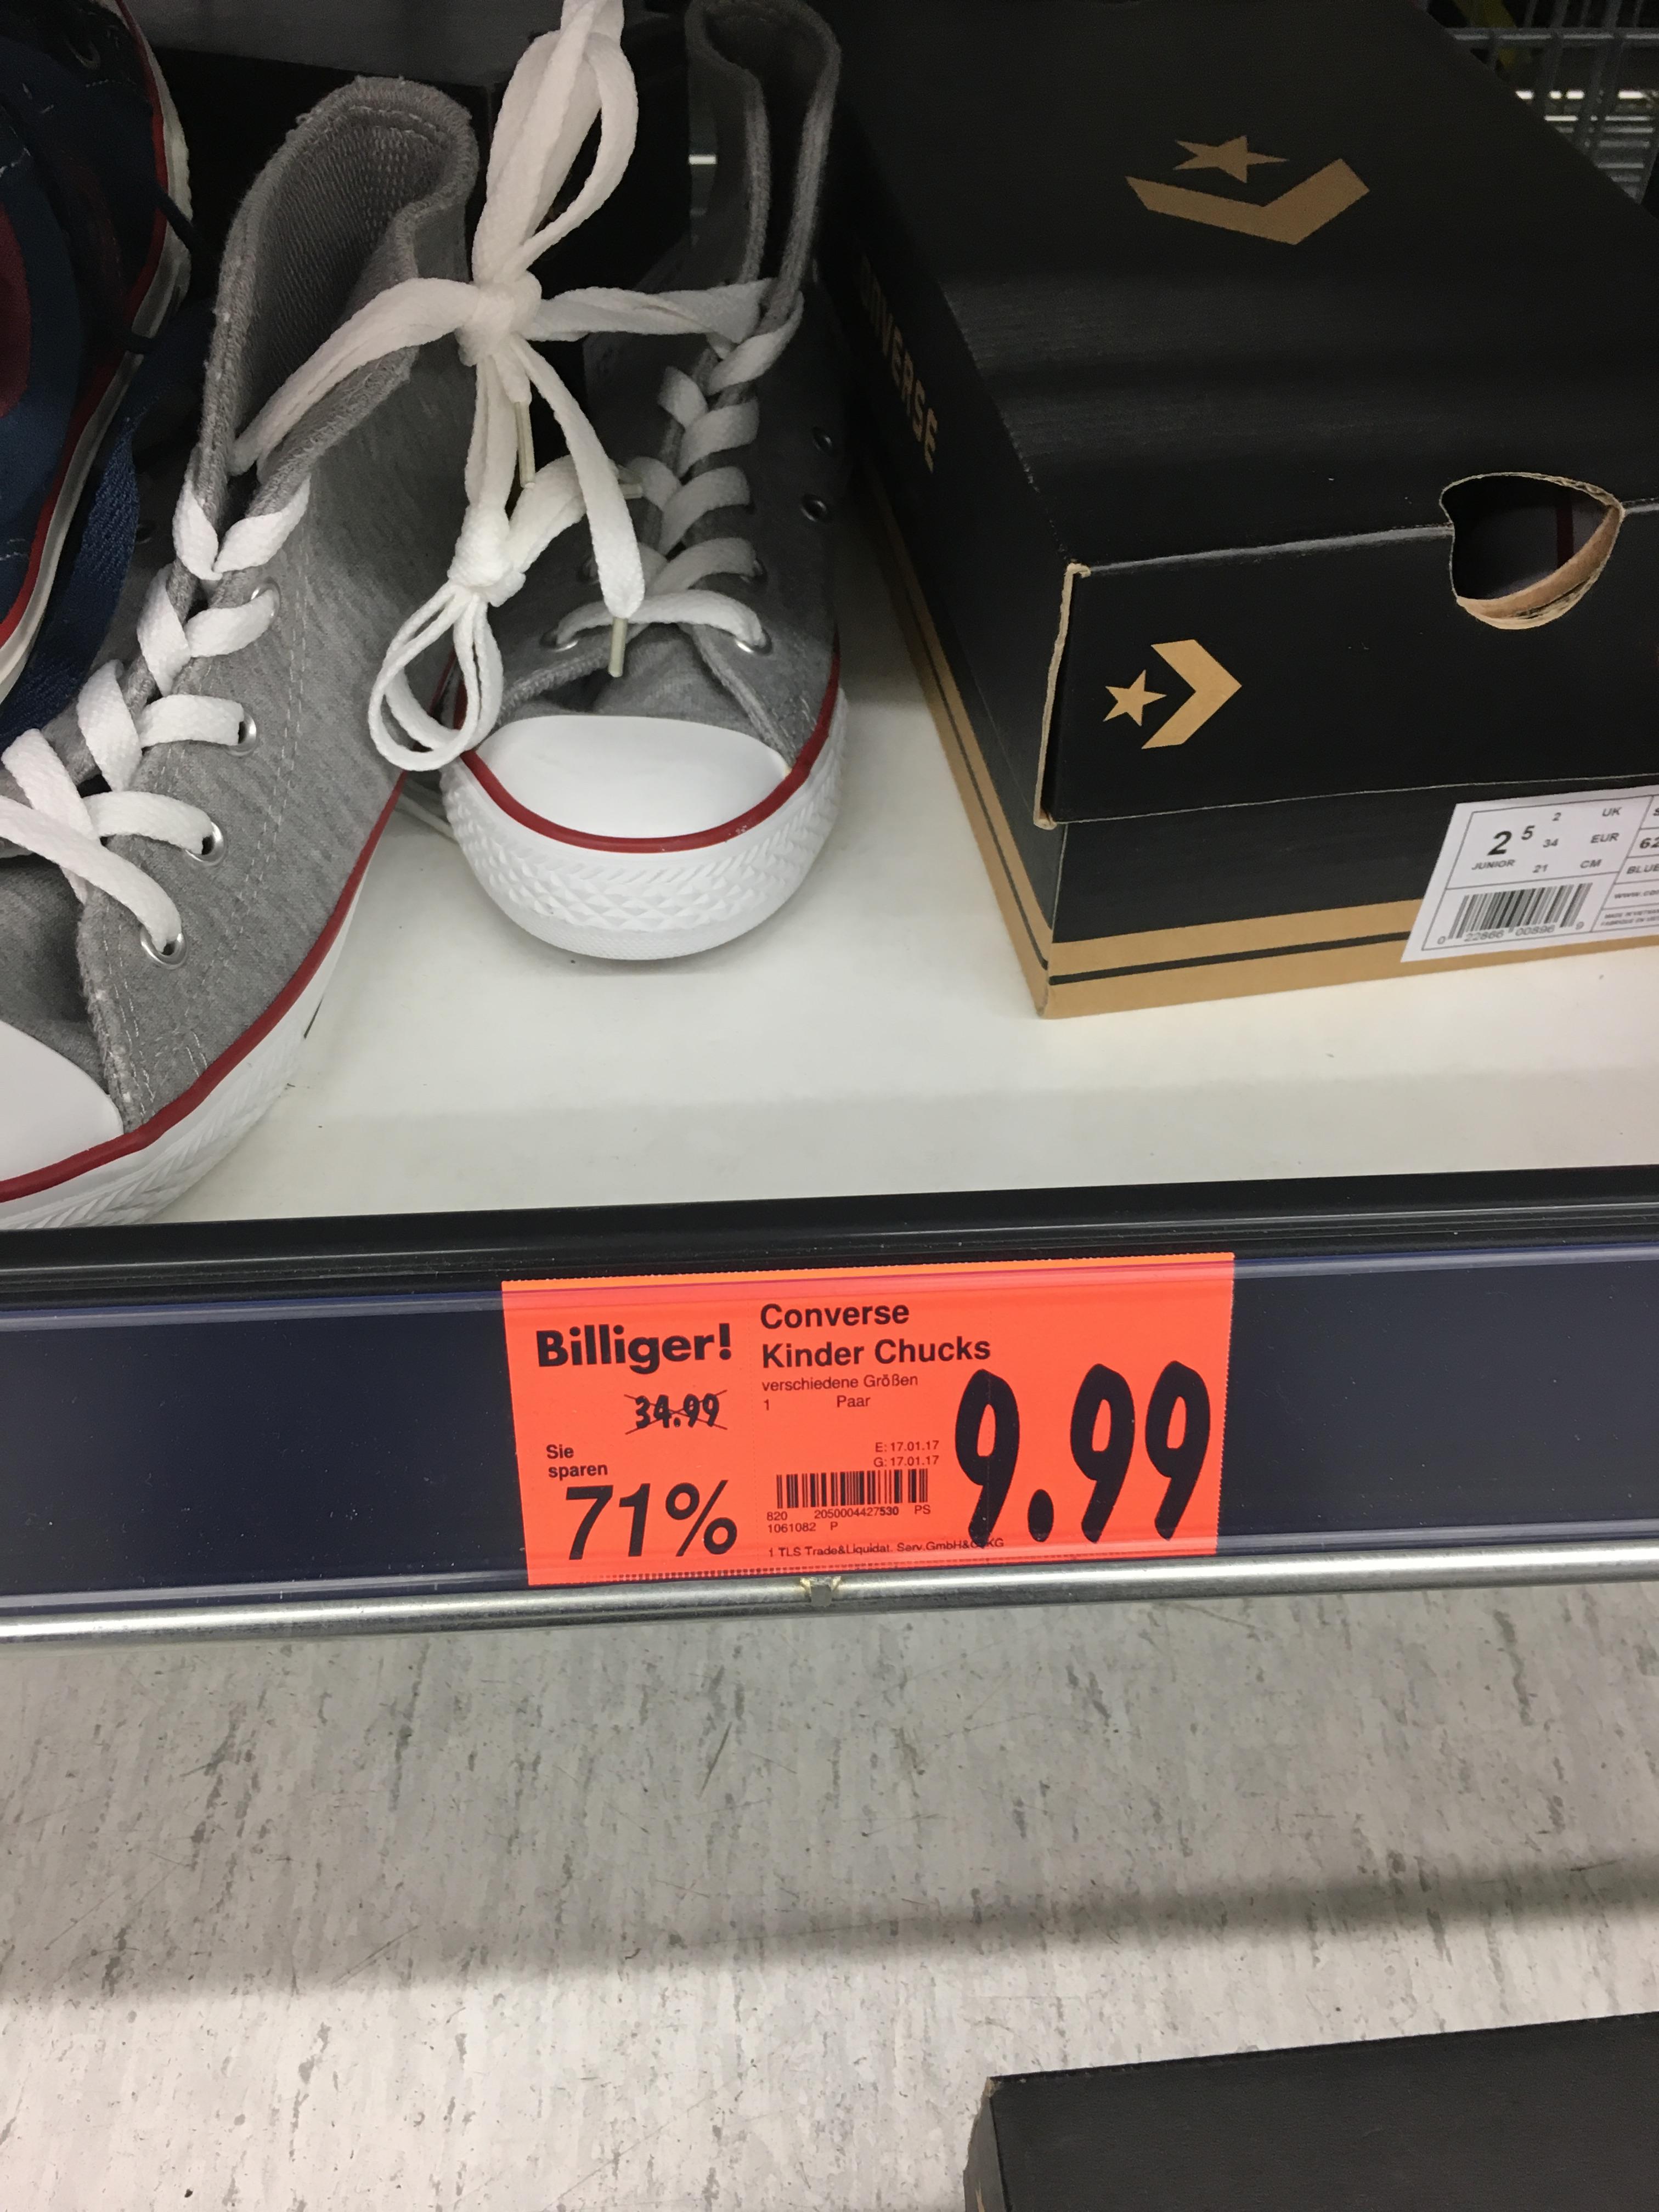 Converse Kinder Chucks abverkauft Kaufland Neckarsulm 9,99€